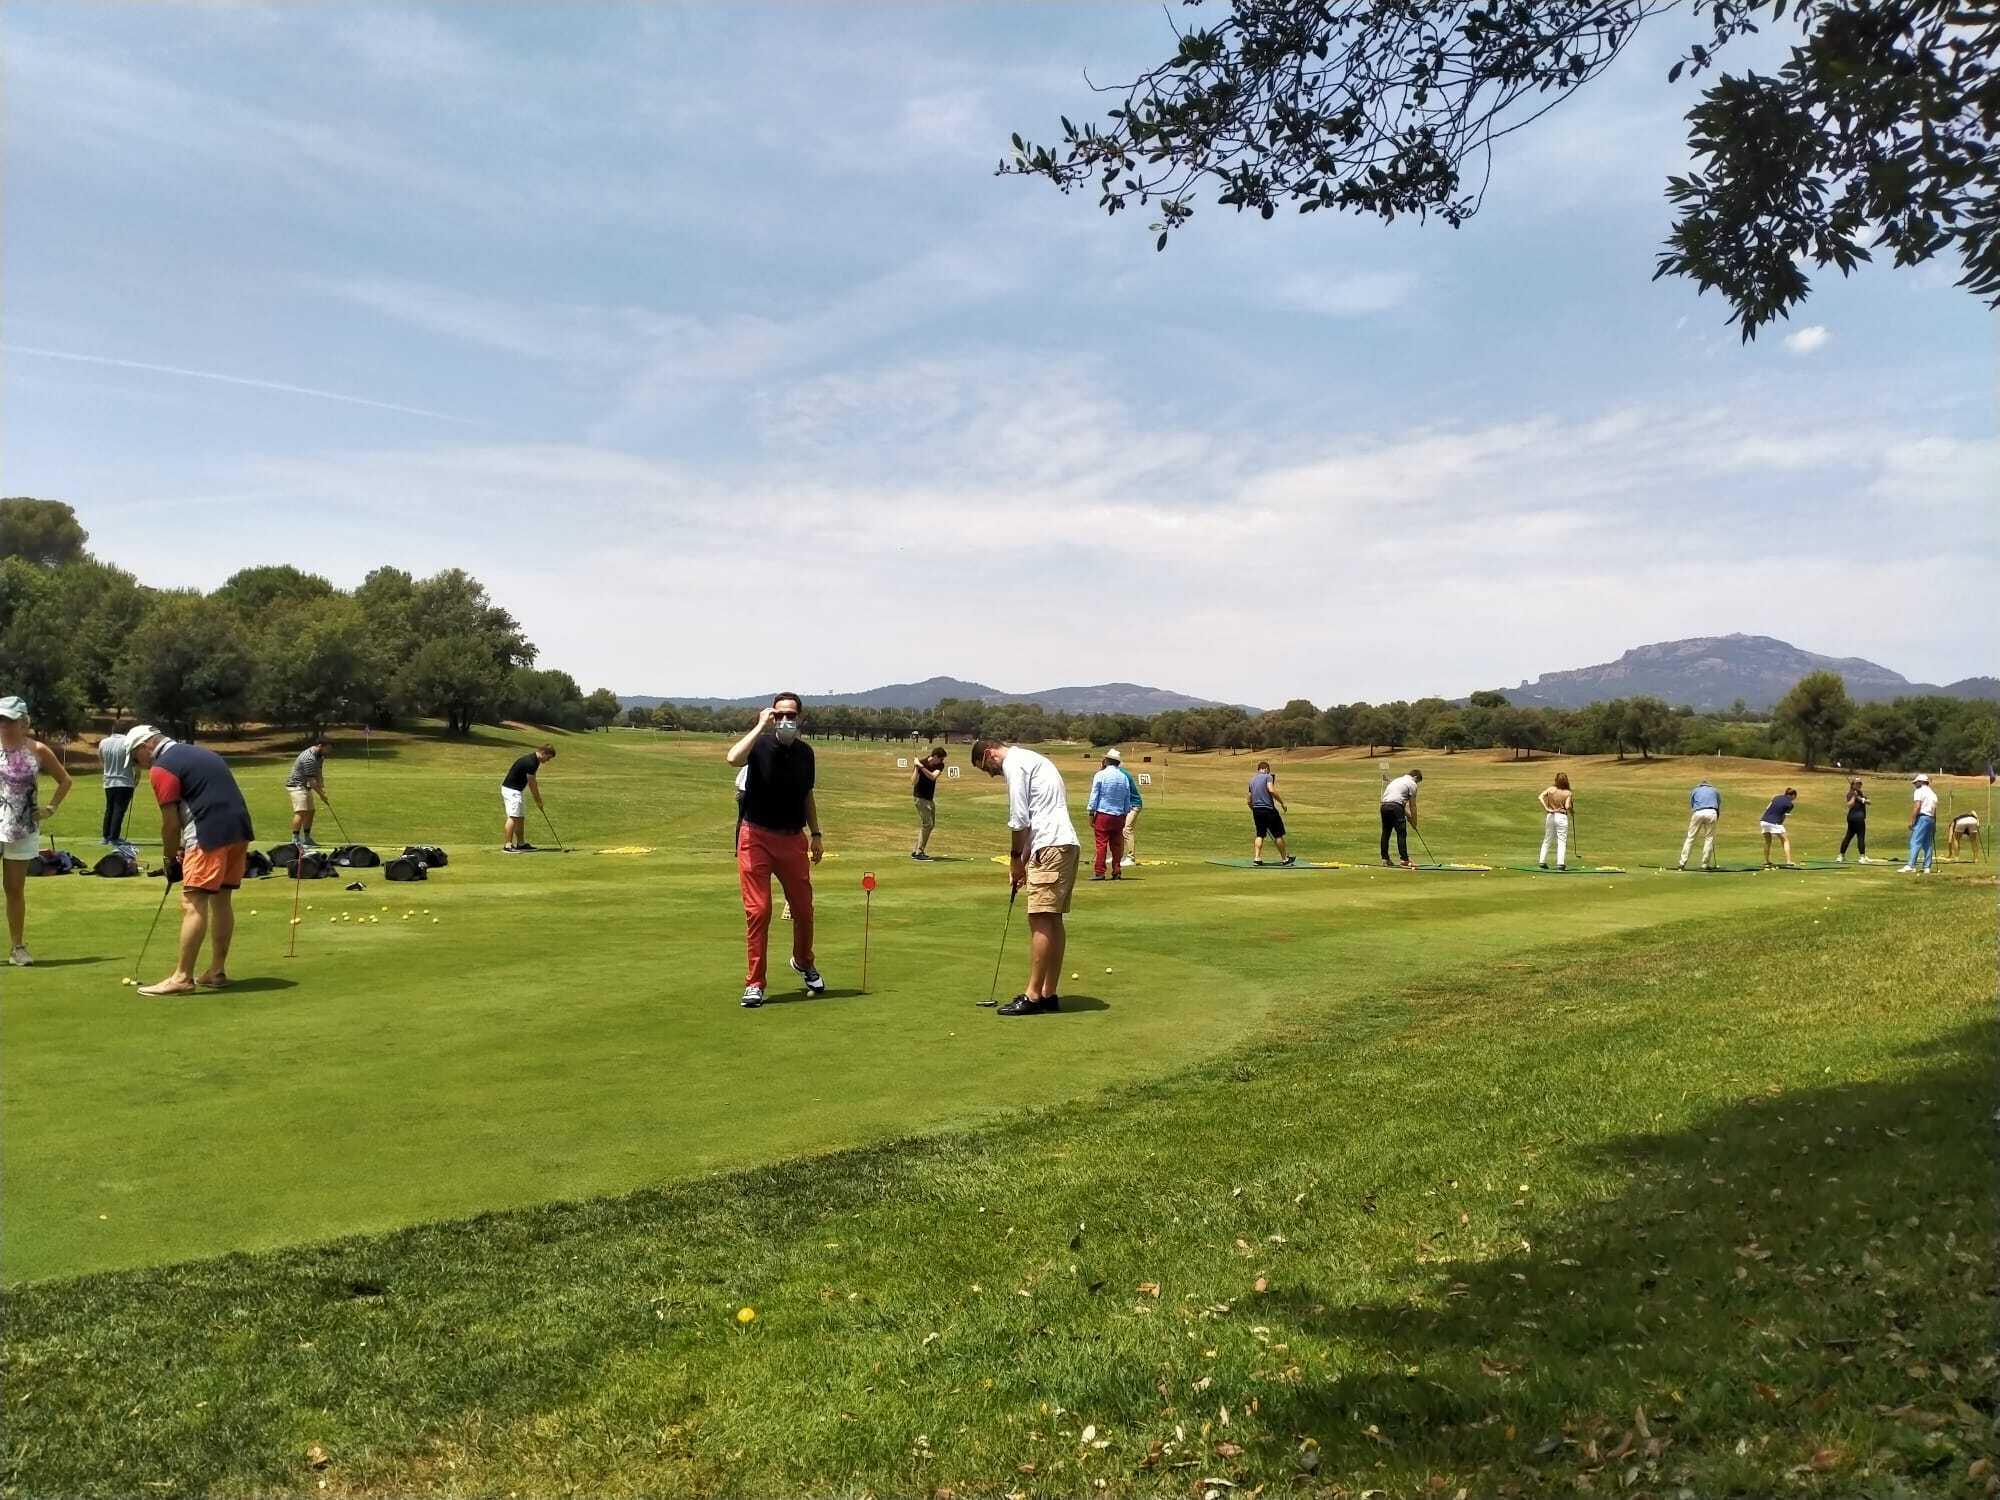 Laboratorios Activa torneo de golf espana 2